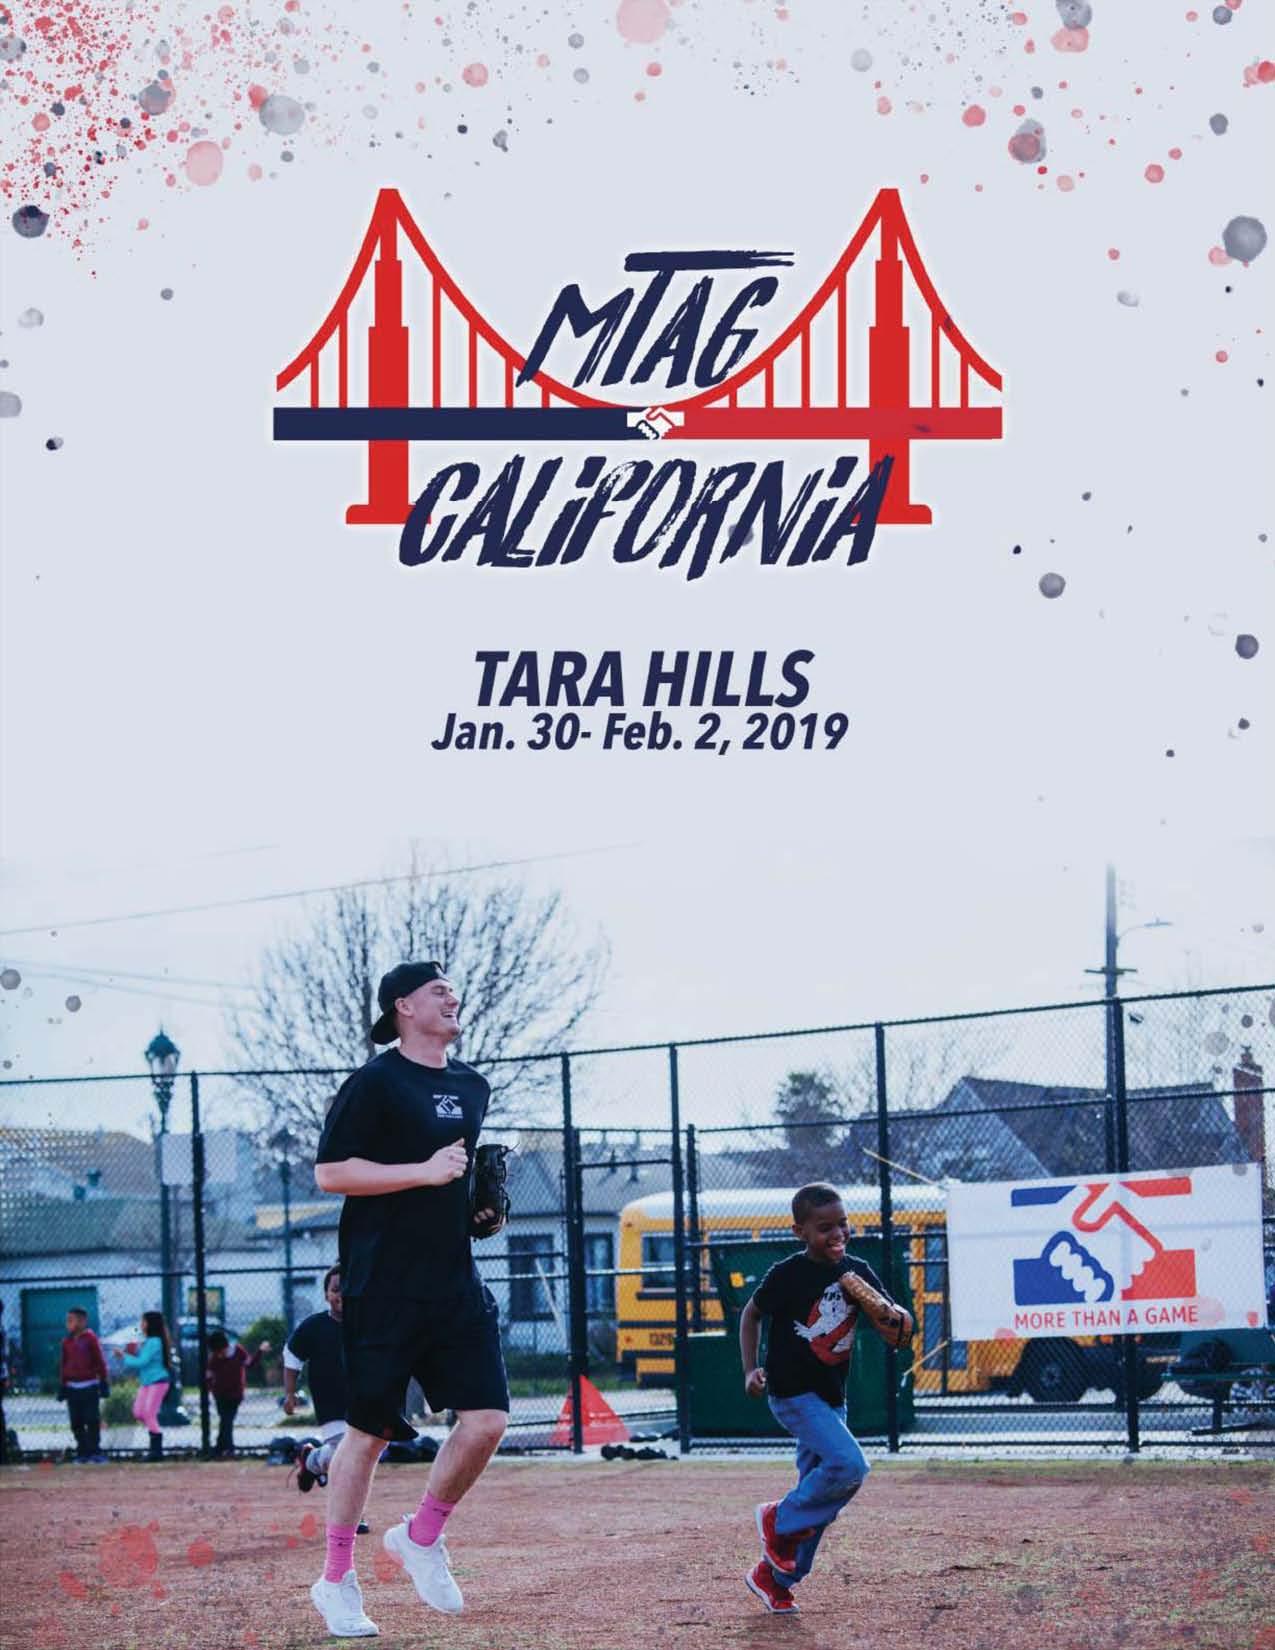 Tara Hills Packet - 25k_Page_1.jpg